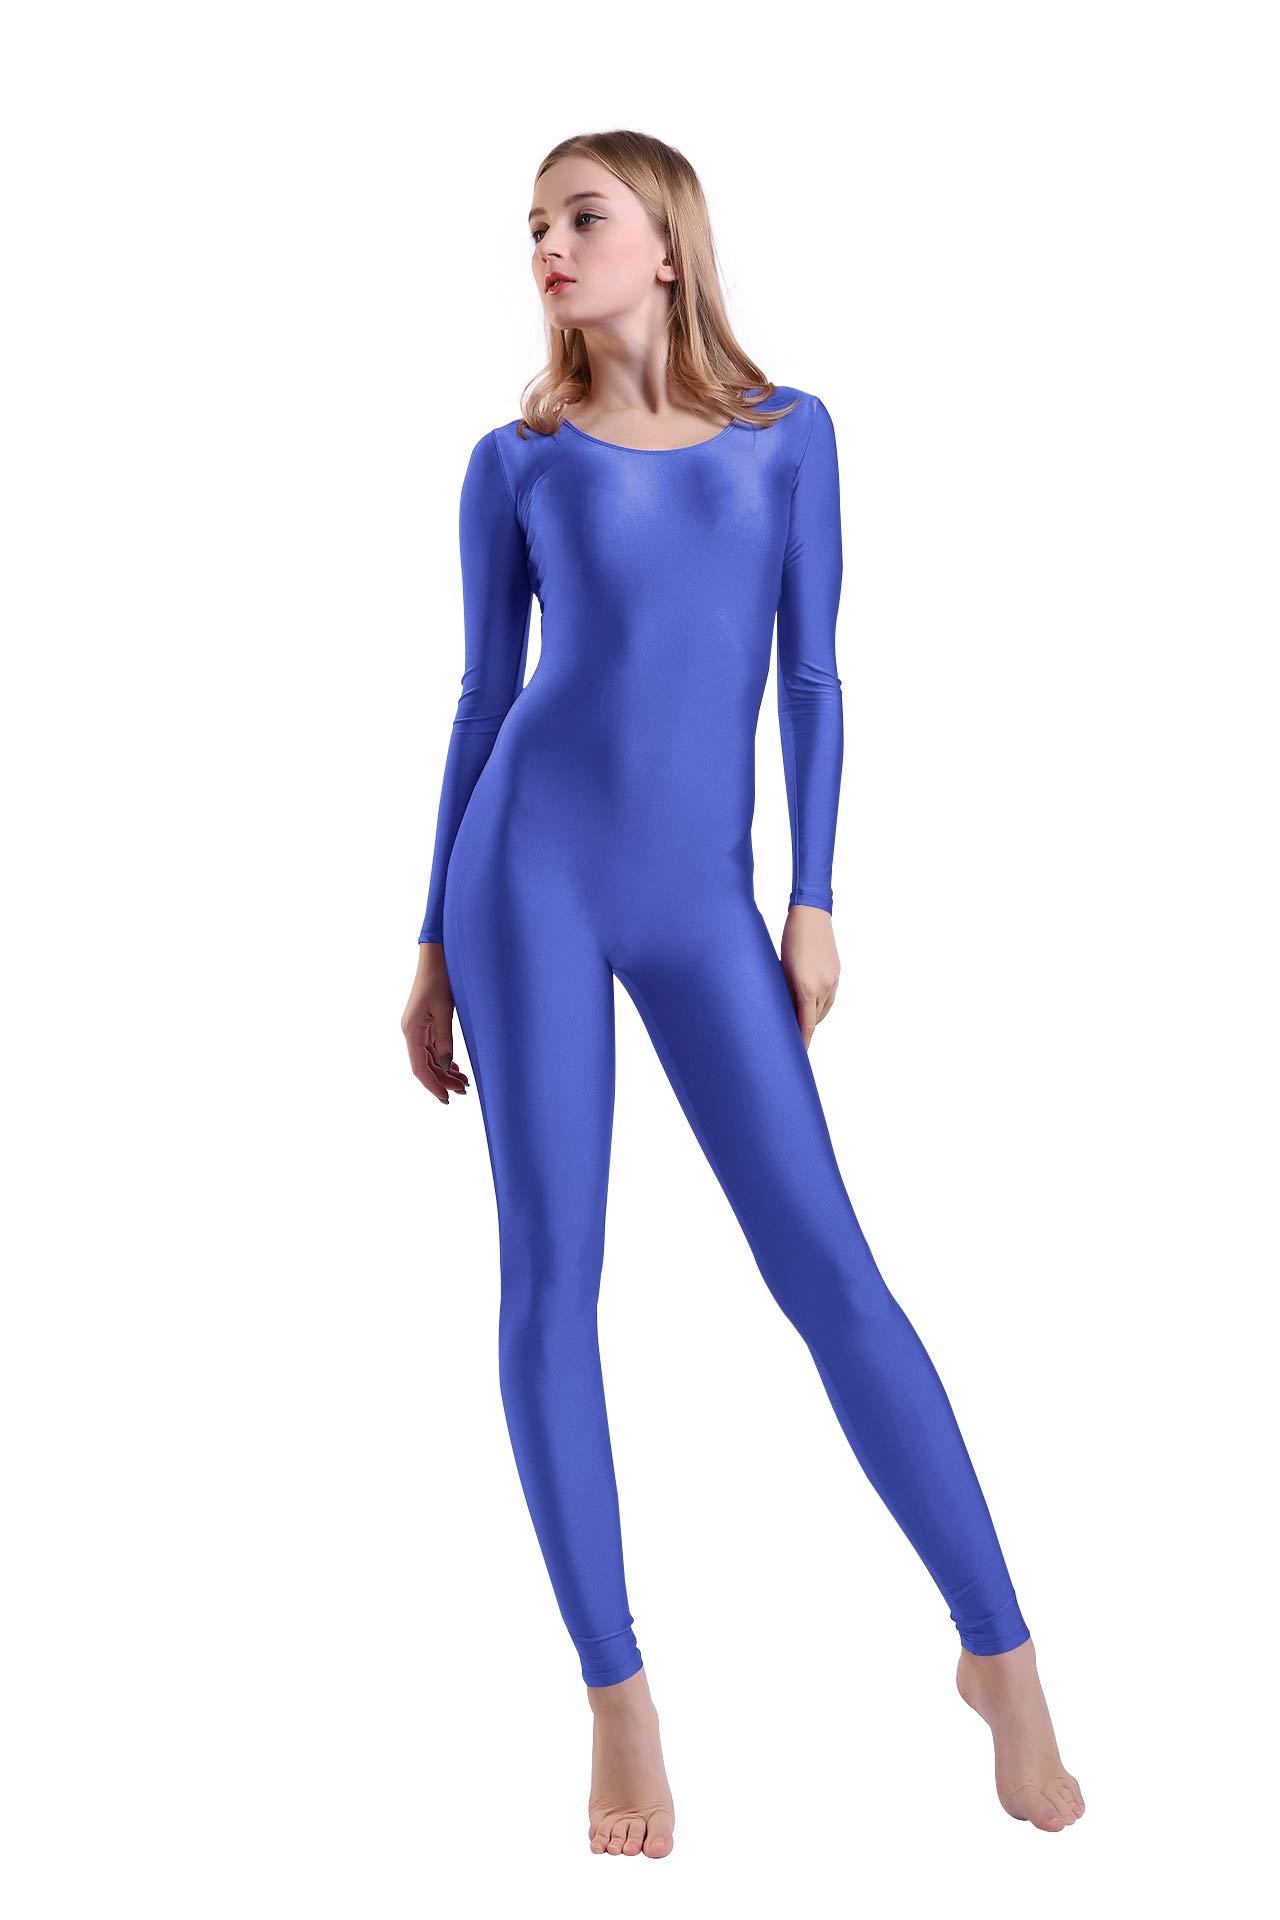 Kepblom Women's Long Sleeve Scoop Neck Unitard Spandex Bodysuit for Dance Gymnastic Costume by Kepblom